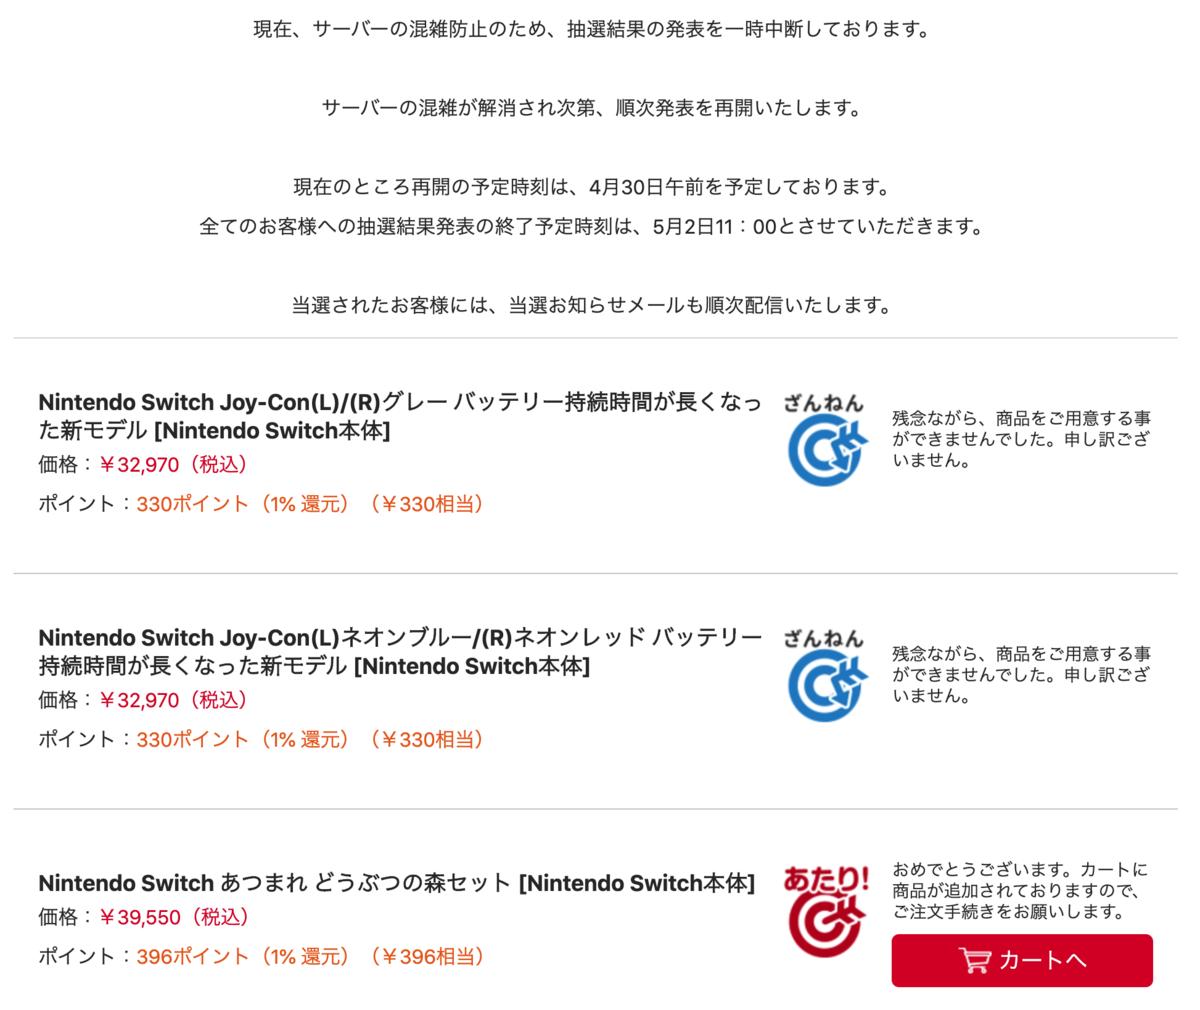 f:id:harunobuta:20200508210451p:plain